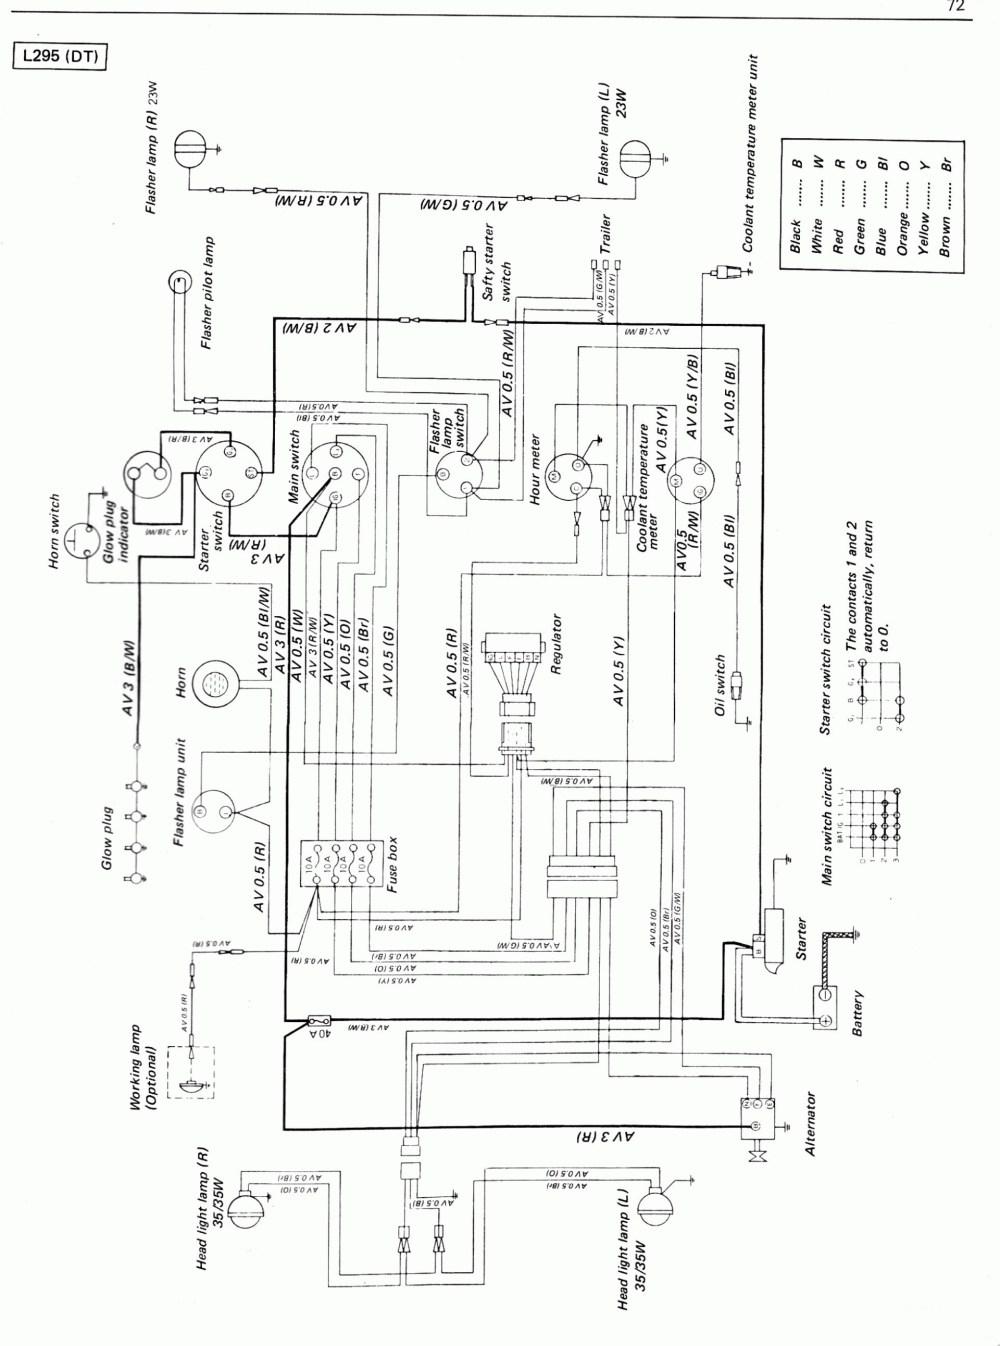 medium resolution of kubota bx tractor wiring diagrams headlights kubota bx tractor rh banyan palace com kubota wiring diagram